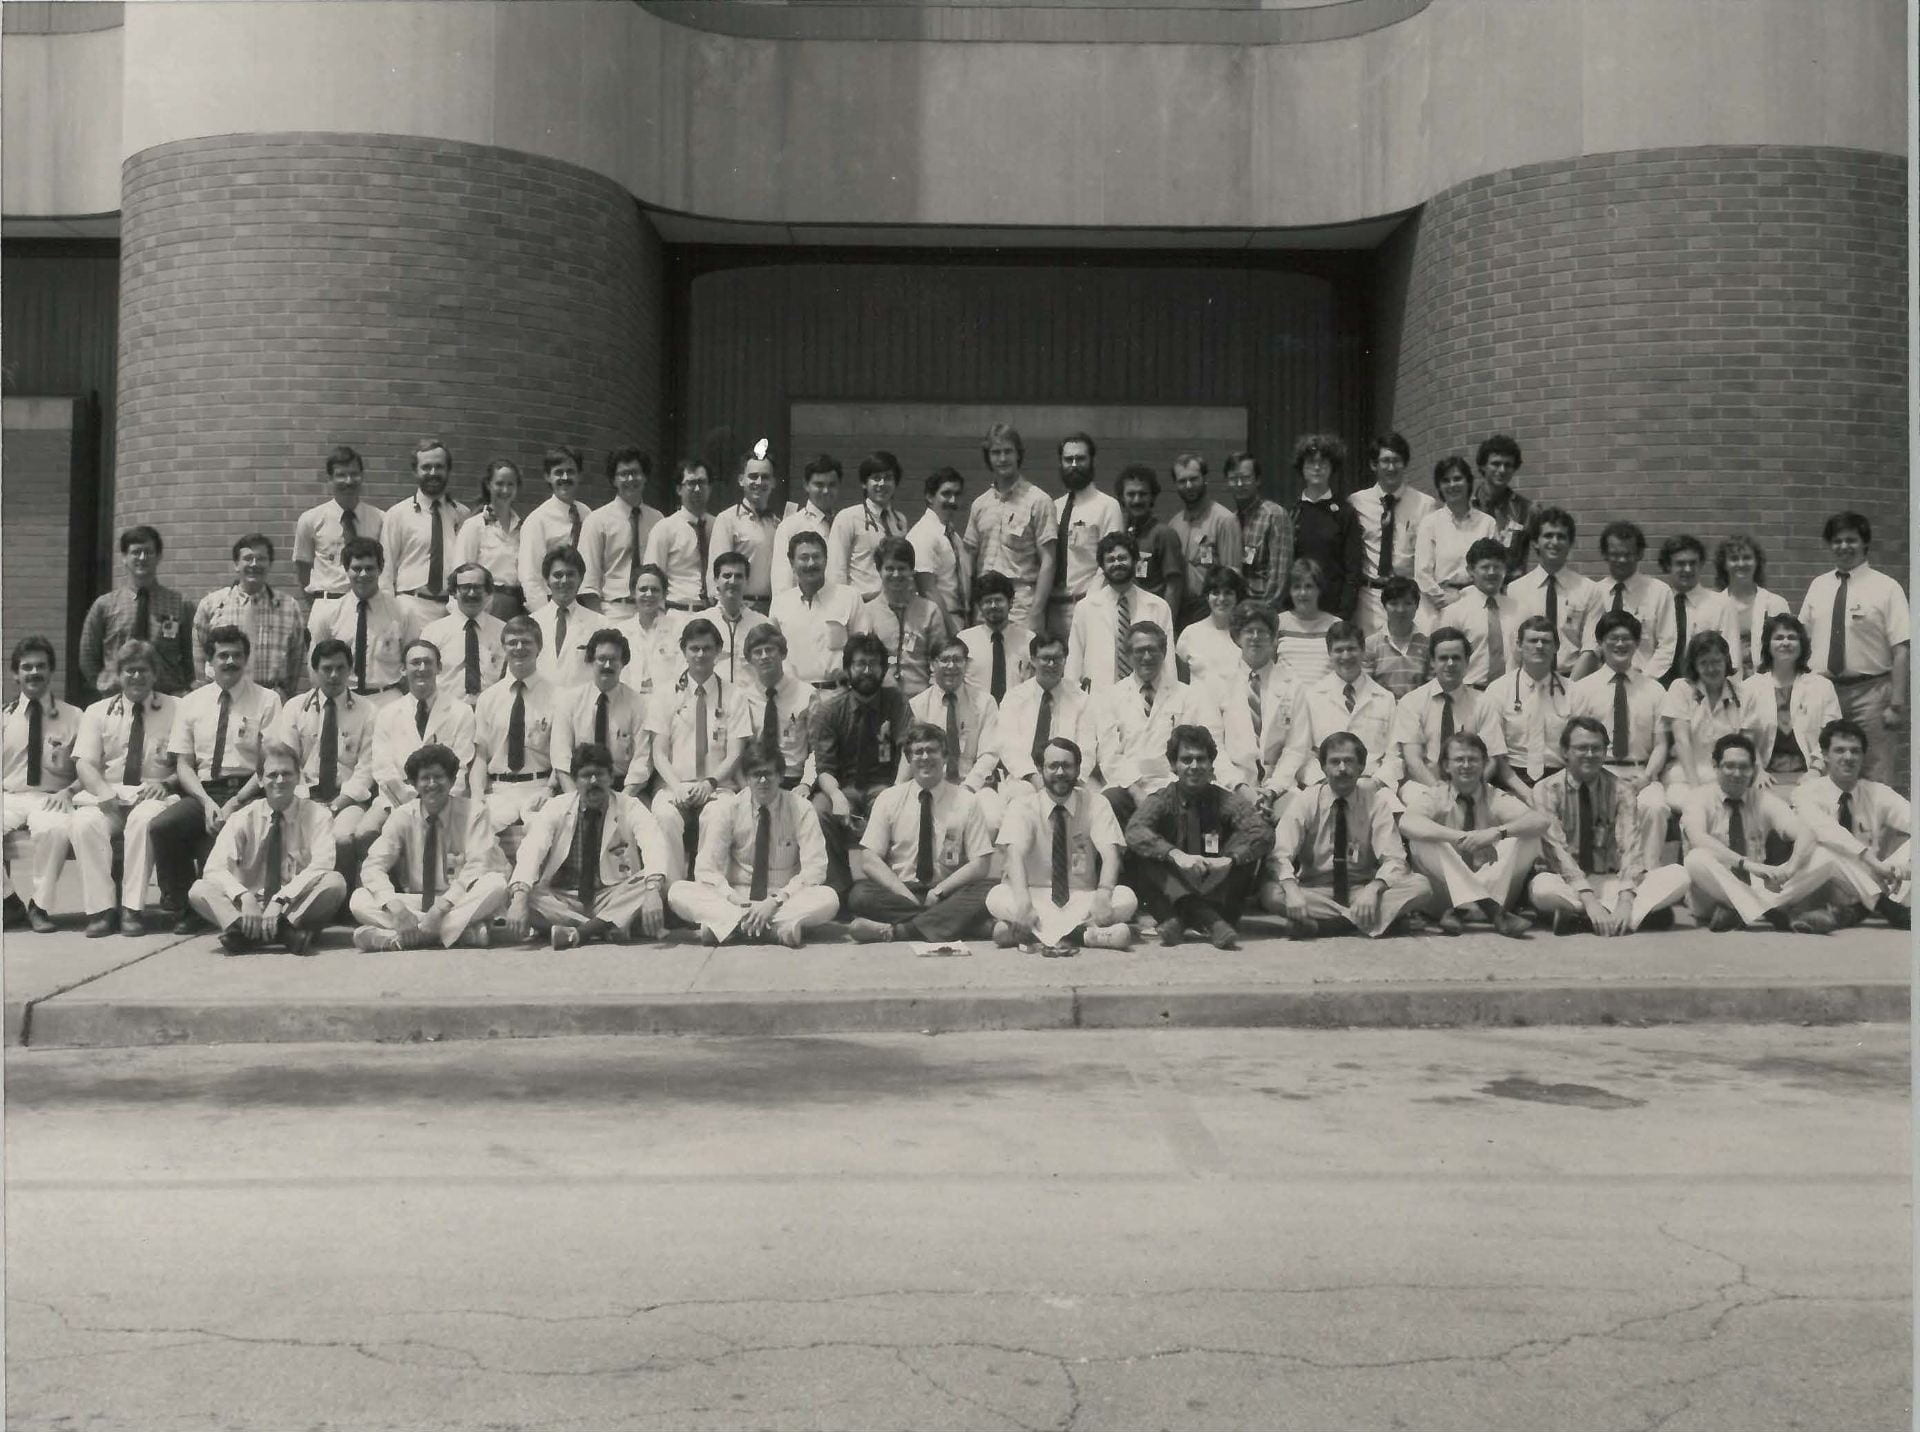 1984 Housestaff Photo